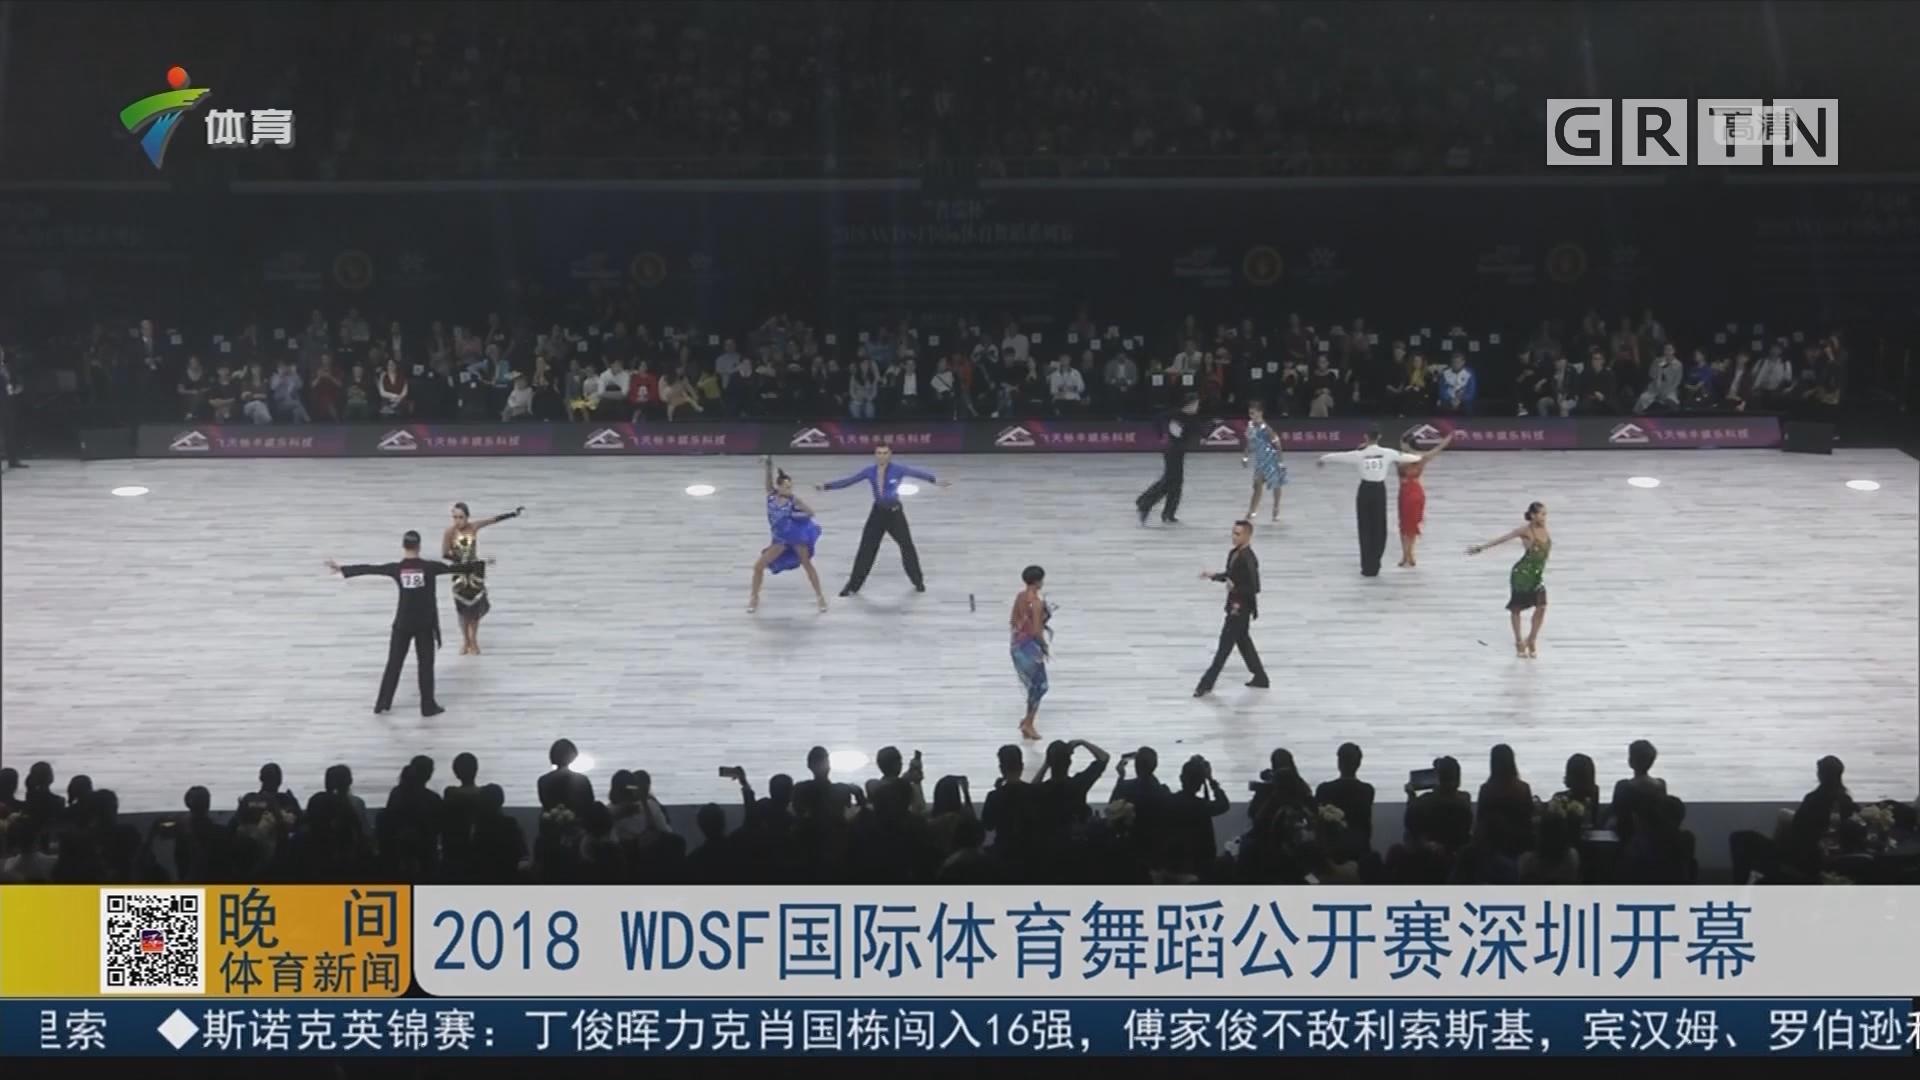 2018 WDSF国际体育舞蹈公开赛深圳开幕